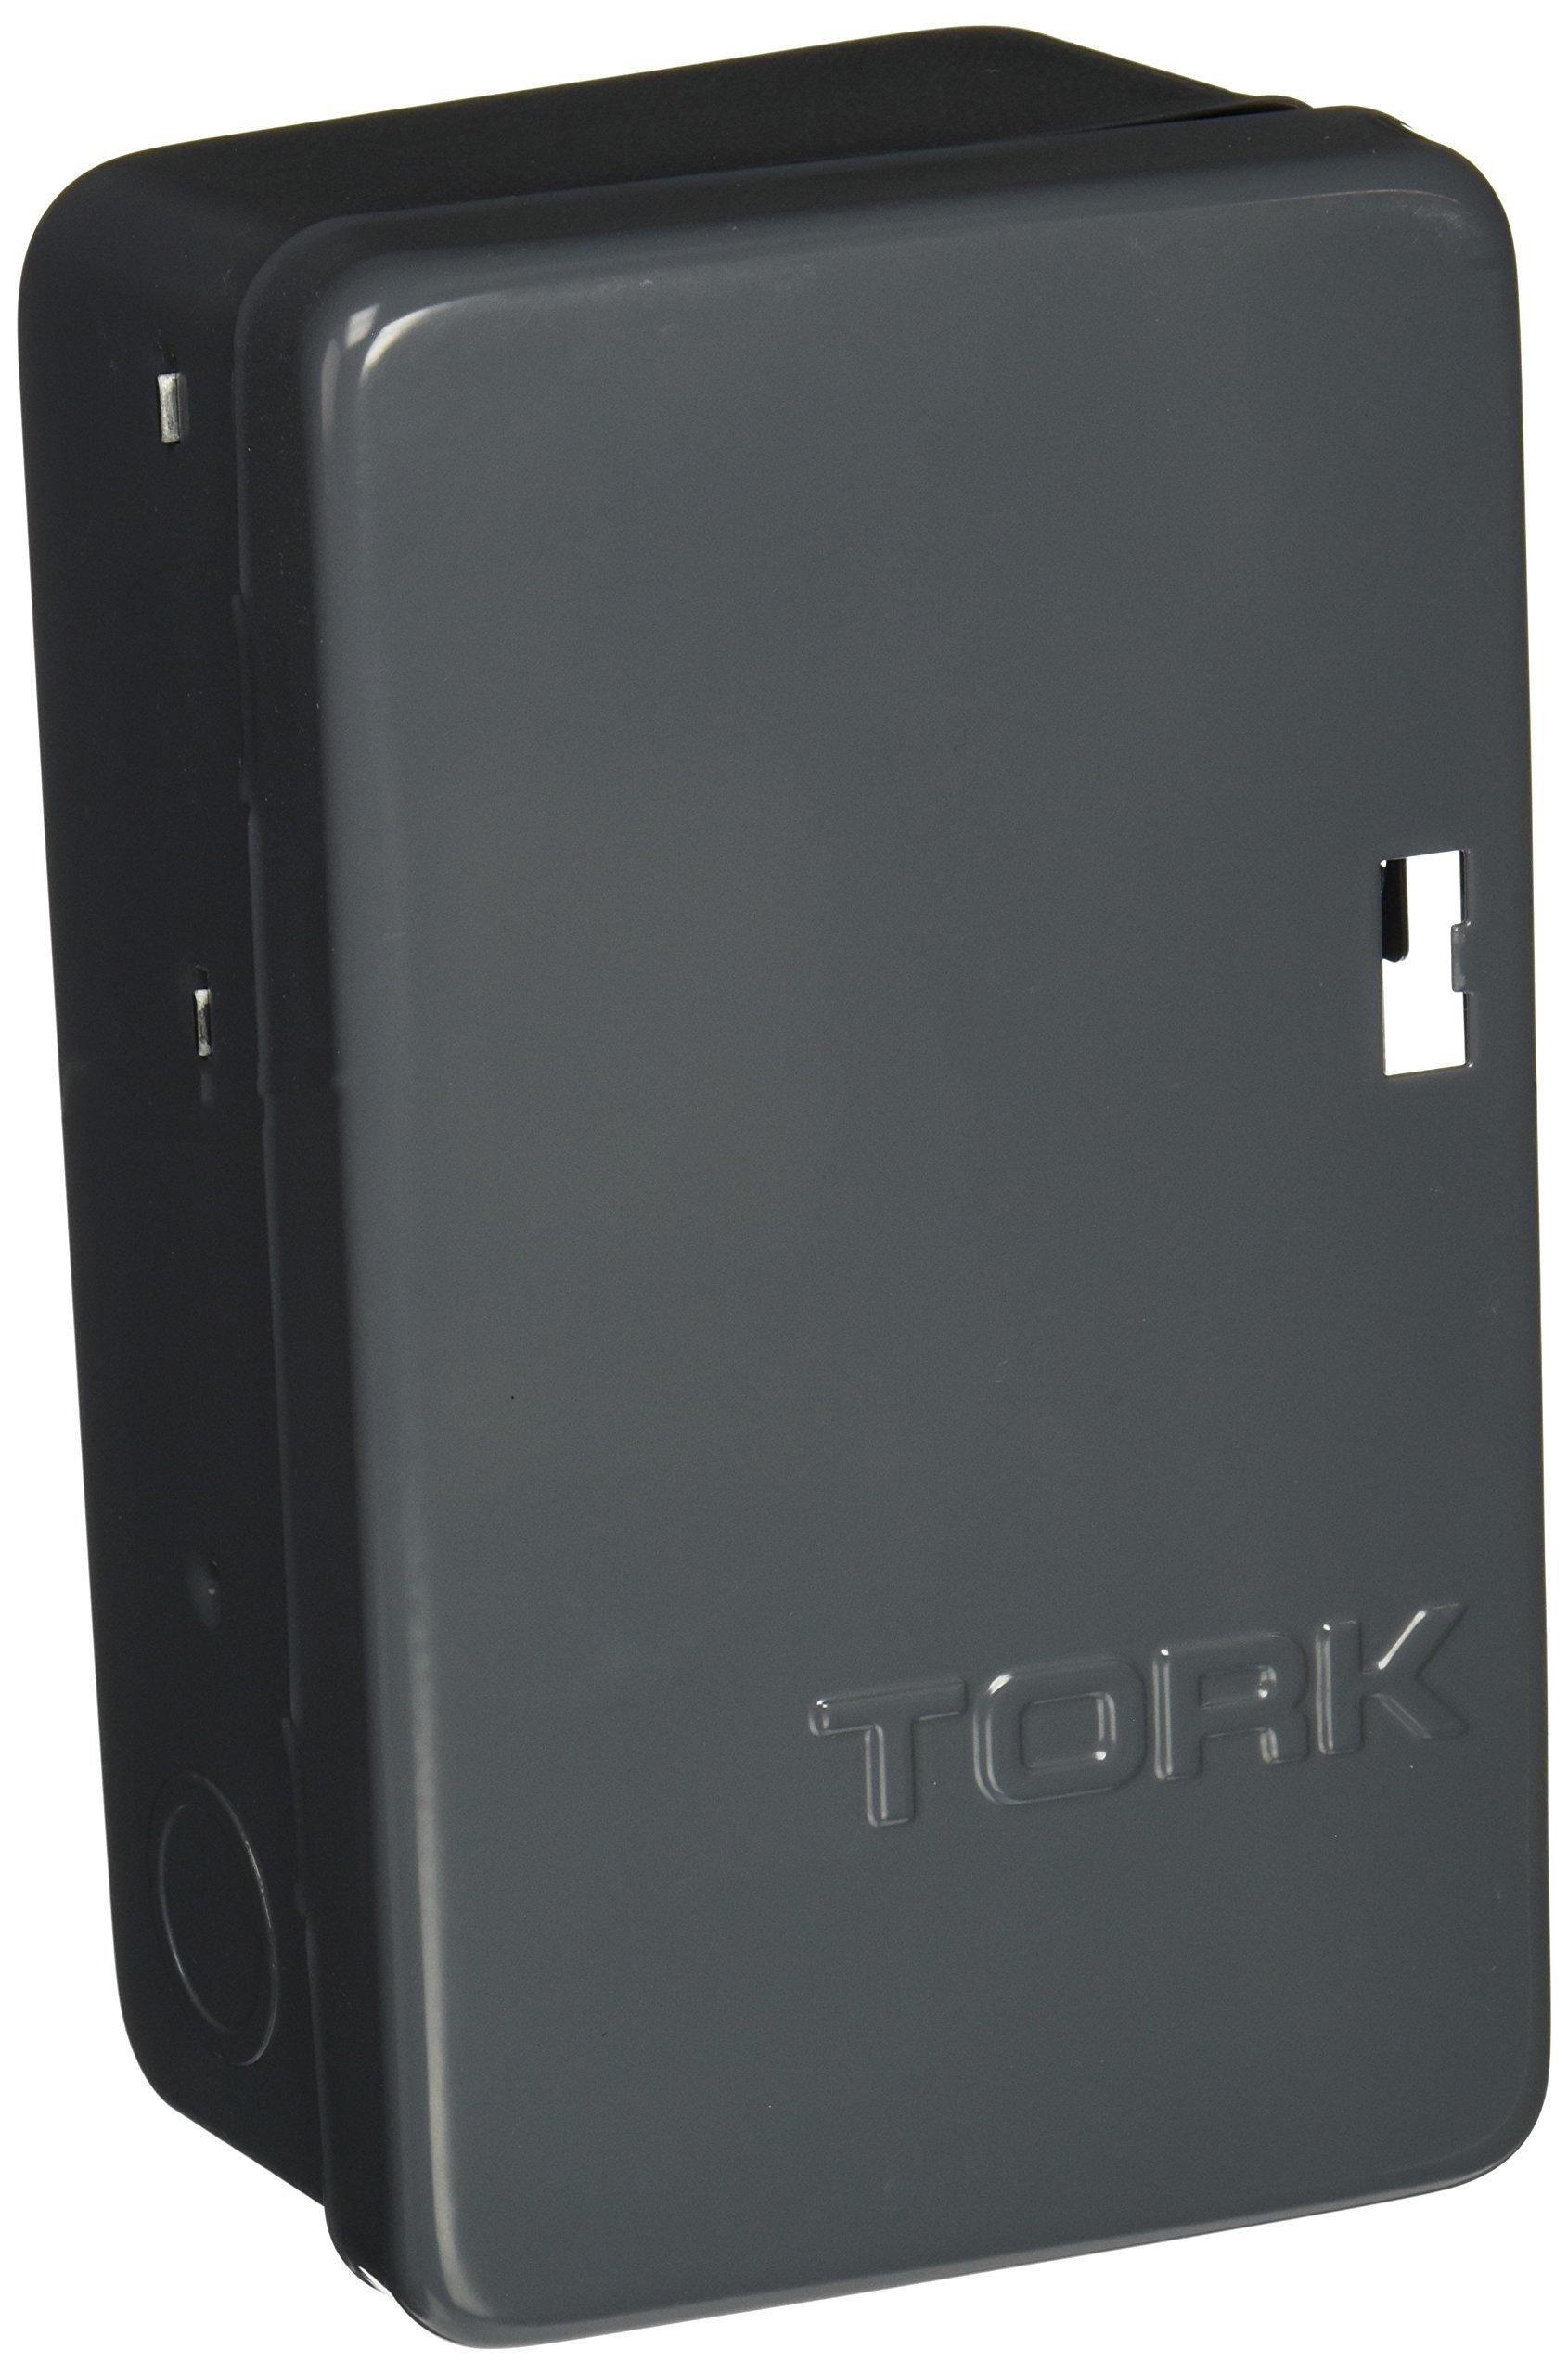 Tork 1103b Dpst 40a 125v 24hr. Dial Timer